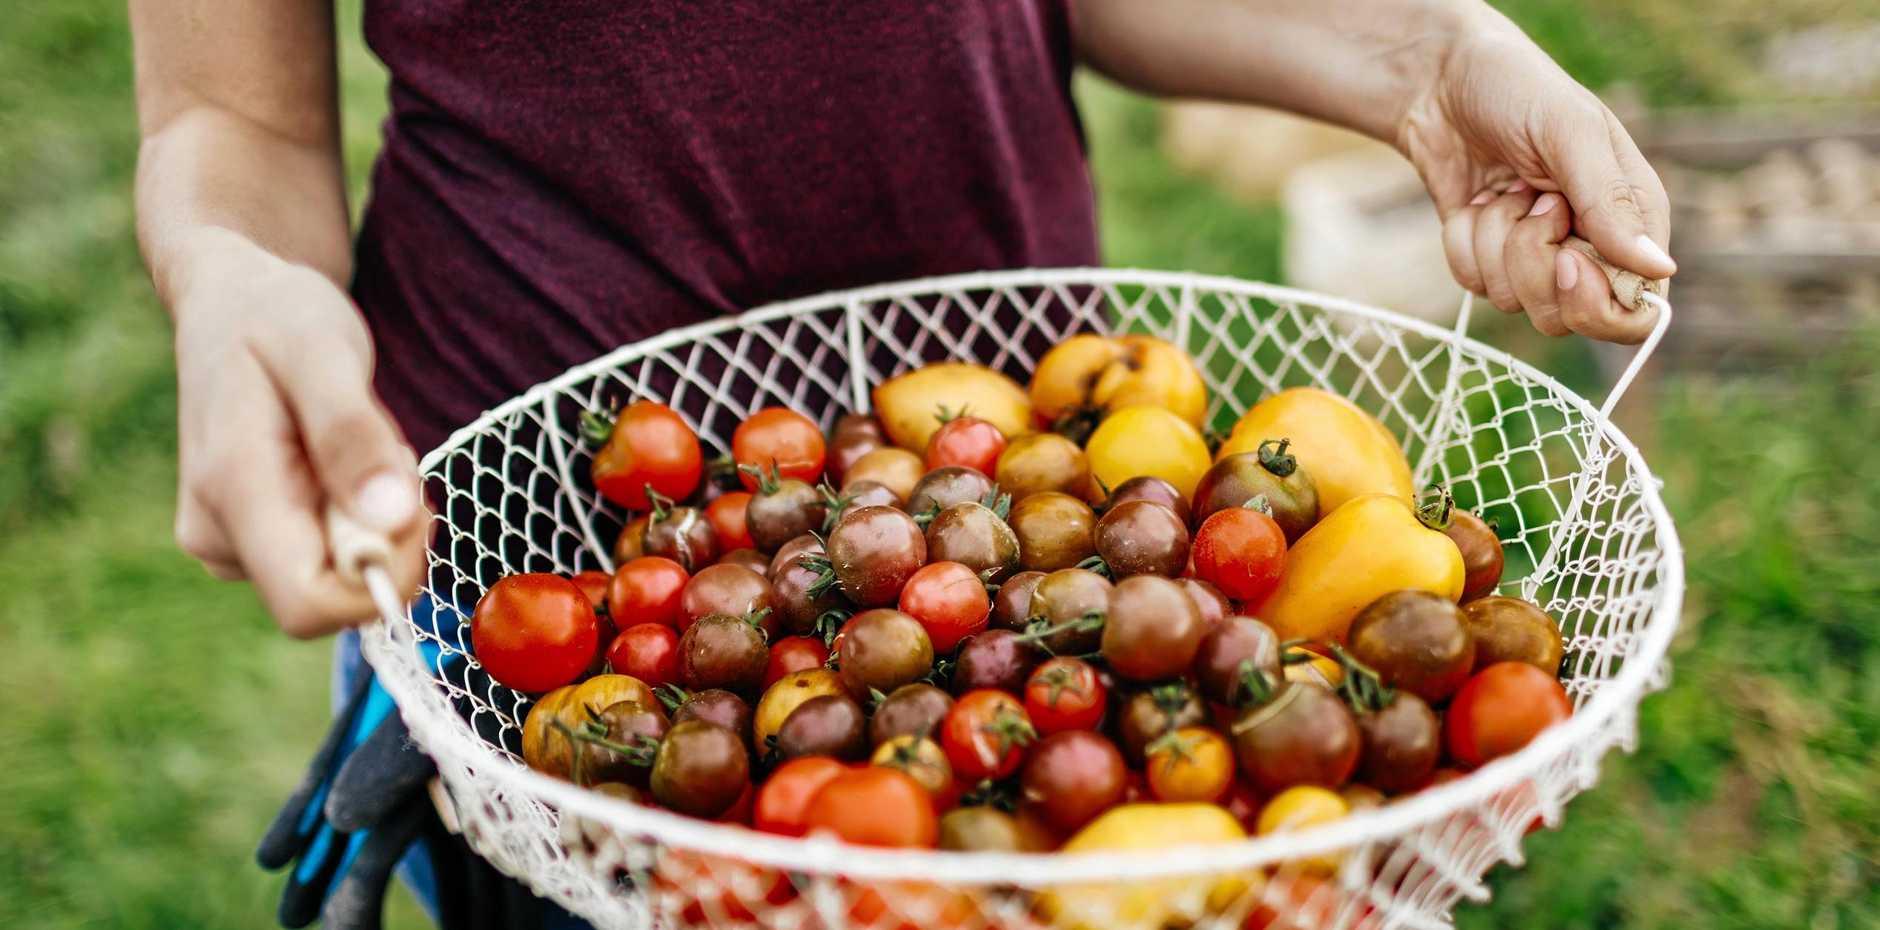 Freshly harvested heirloom tomatoes make a tasty treat.